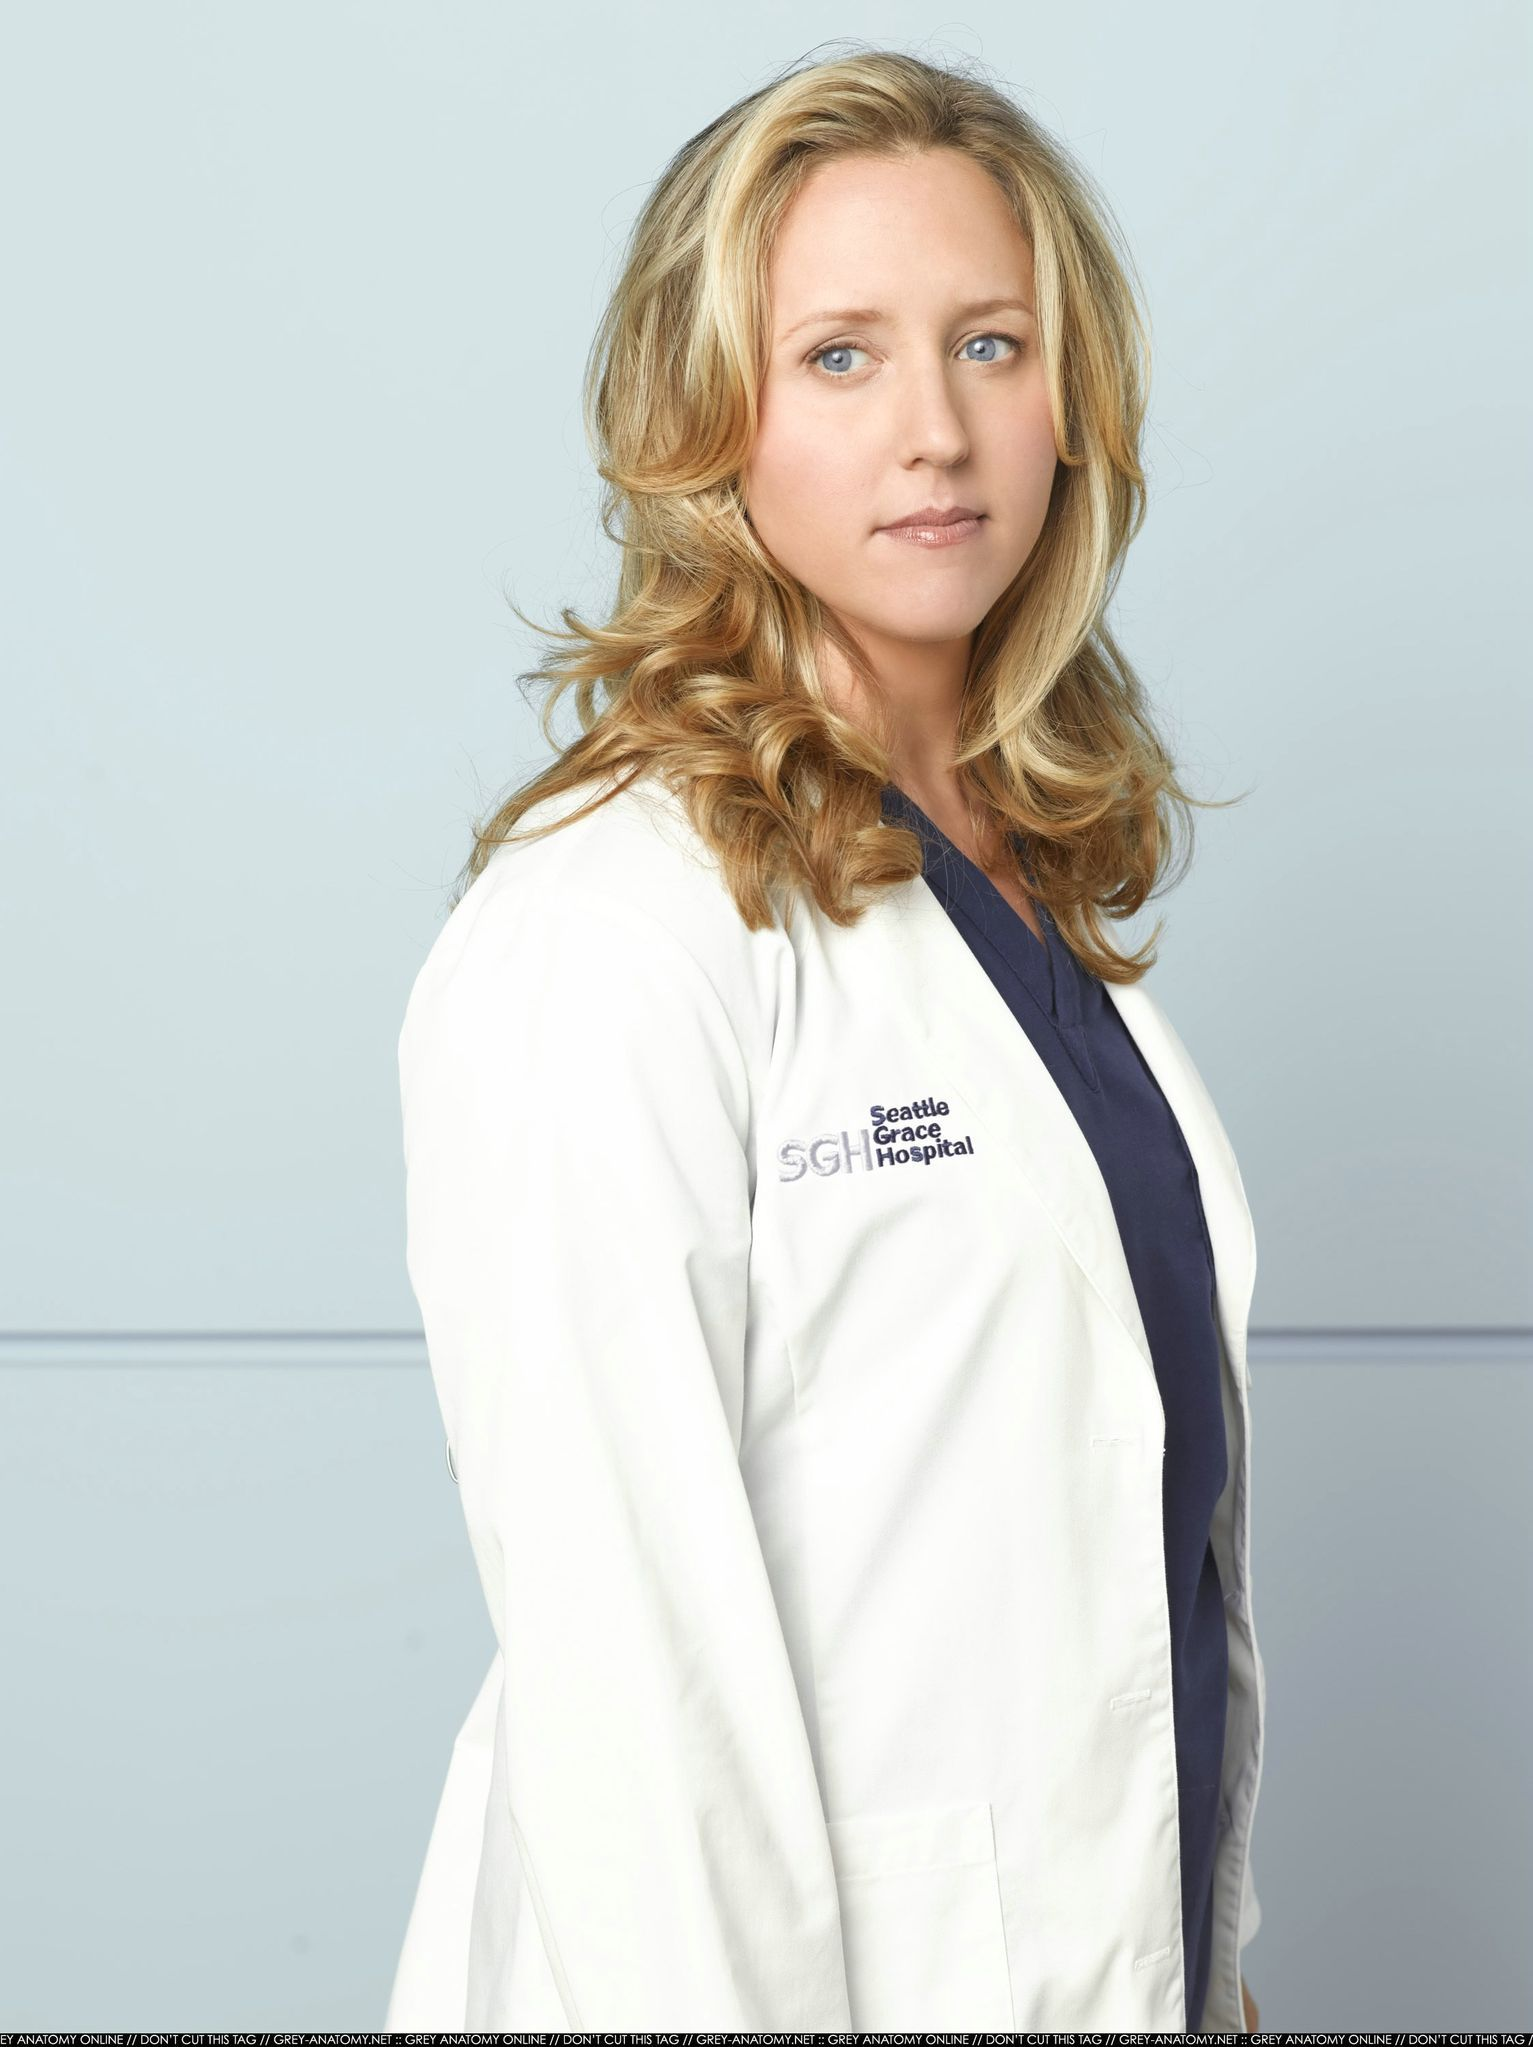 Grey\'s Anatomy - Season 4 Promo   Grey\'s Anatomy   Pinterest